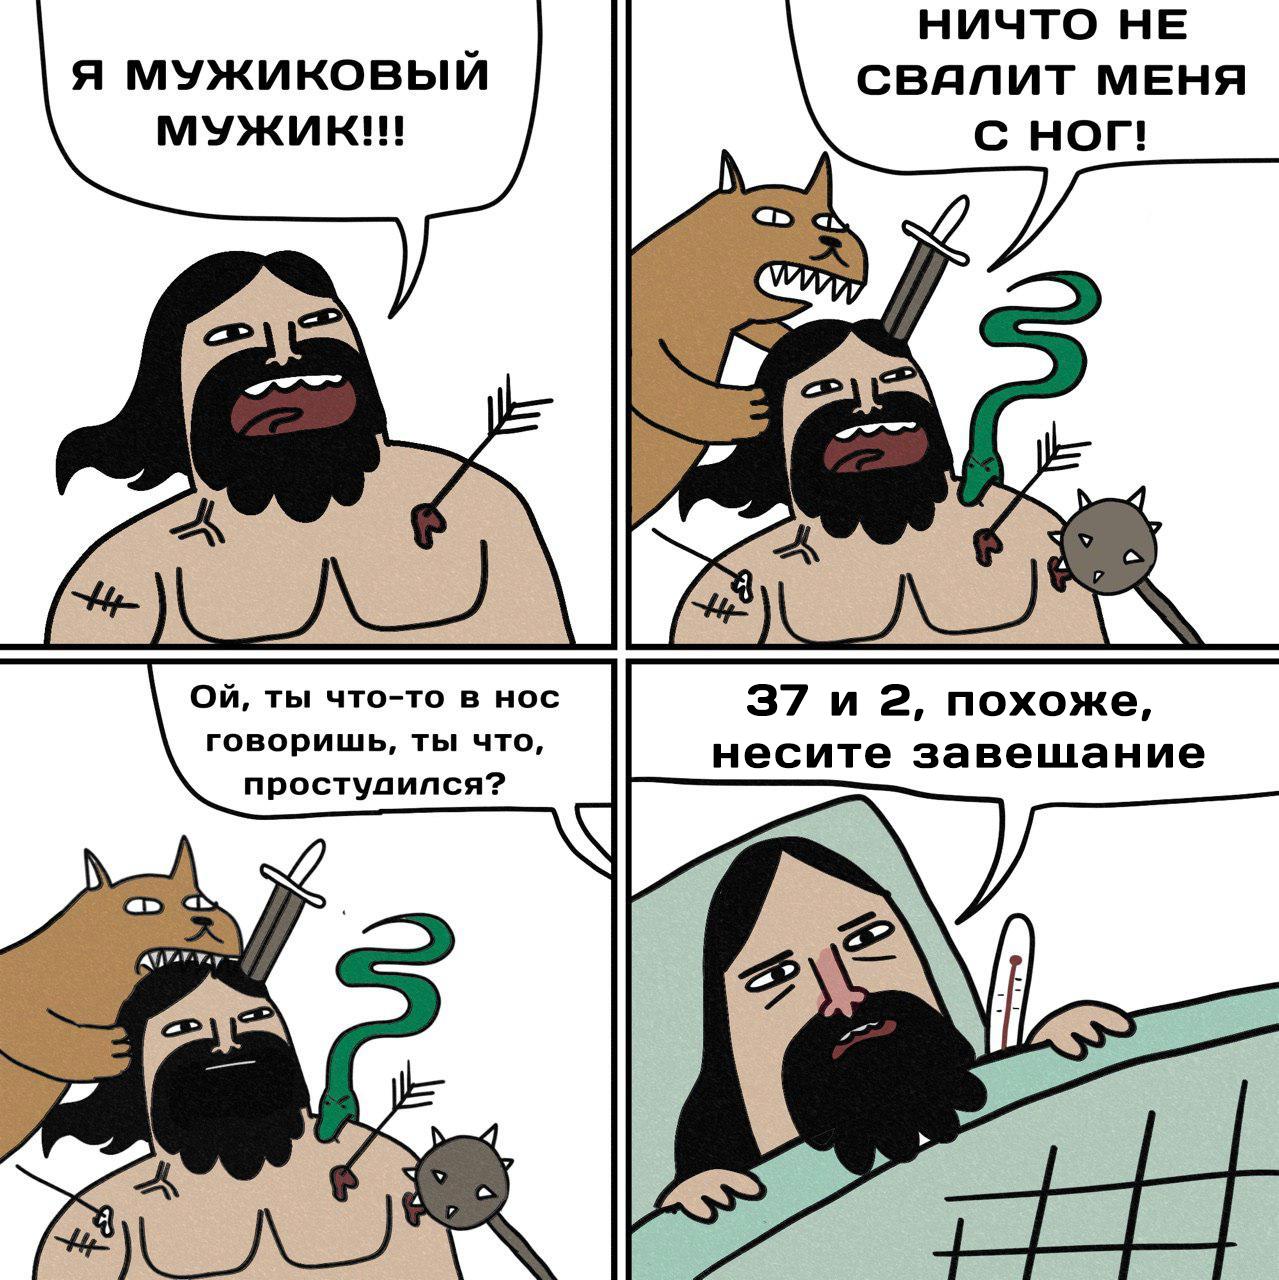 https://cs8.pikabu.ru/post_img/big/2017/12/14/8/1513255655135843601.png